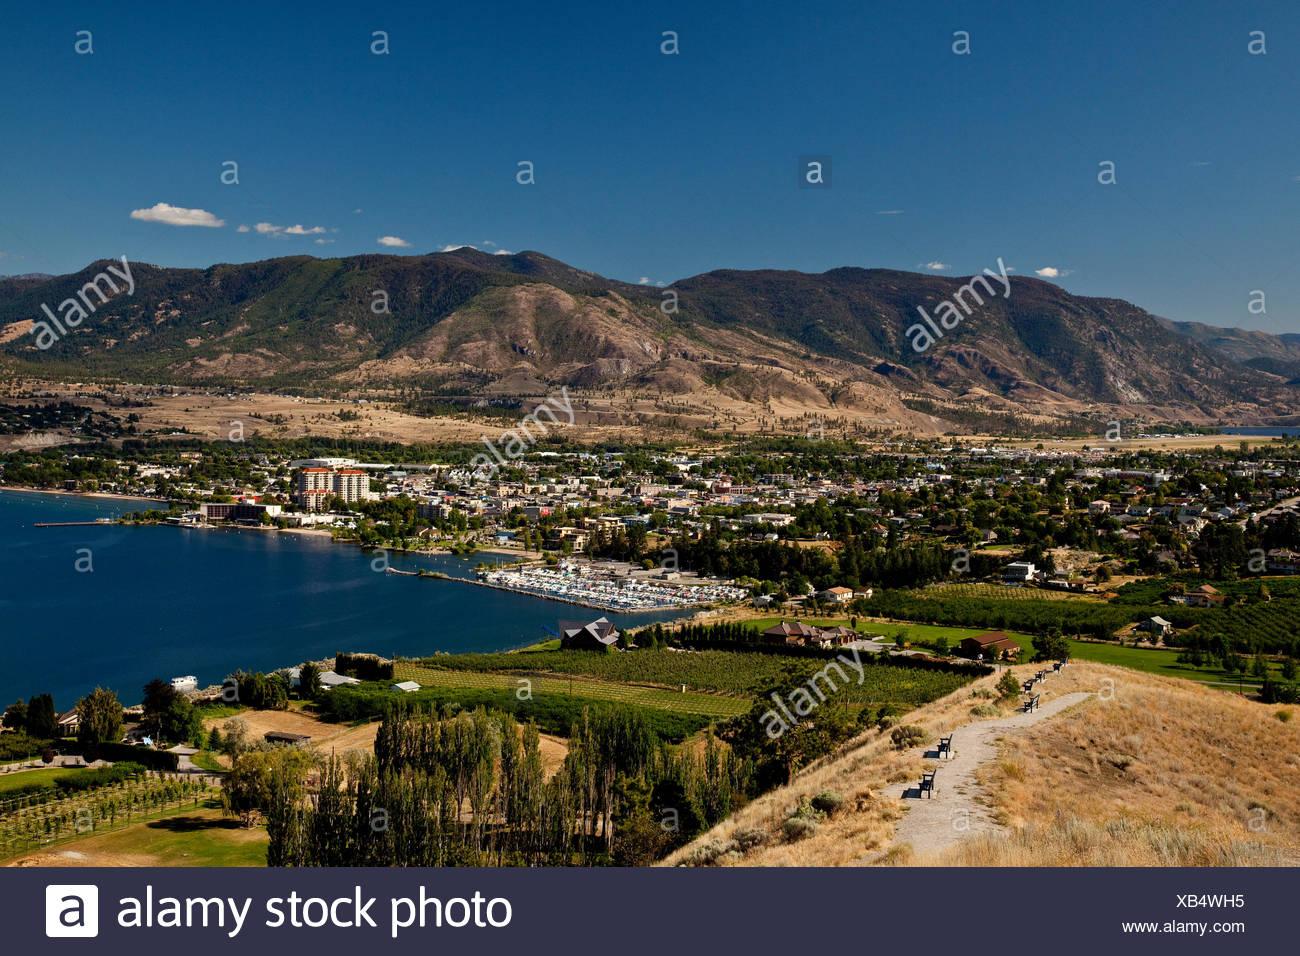 View of Penticton from Naramata Bench, Okanagan Valley, BC, Canada - Stock Image